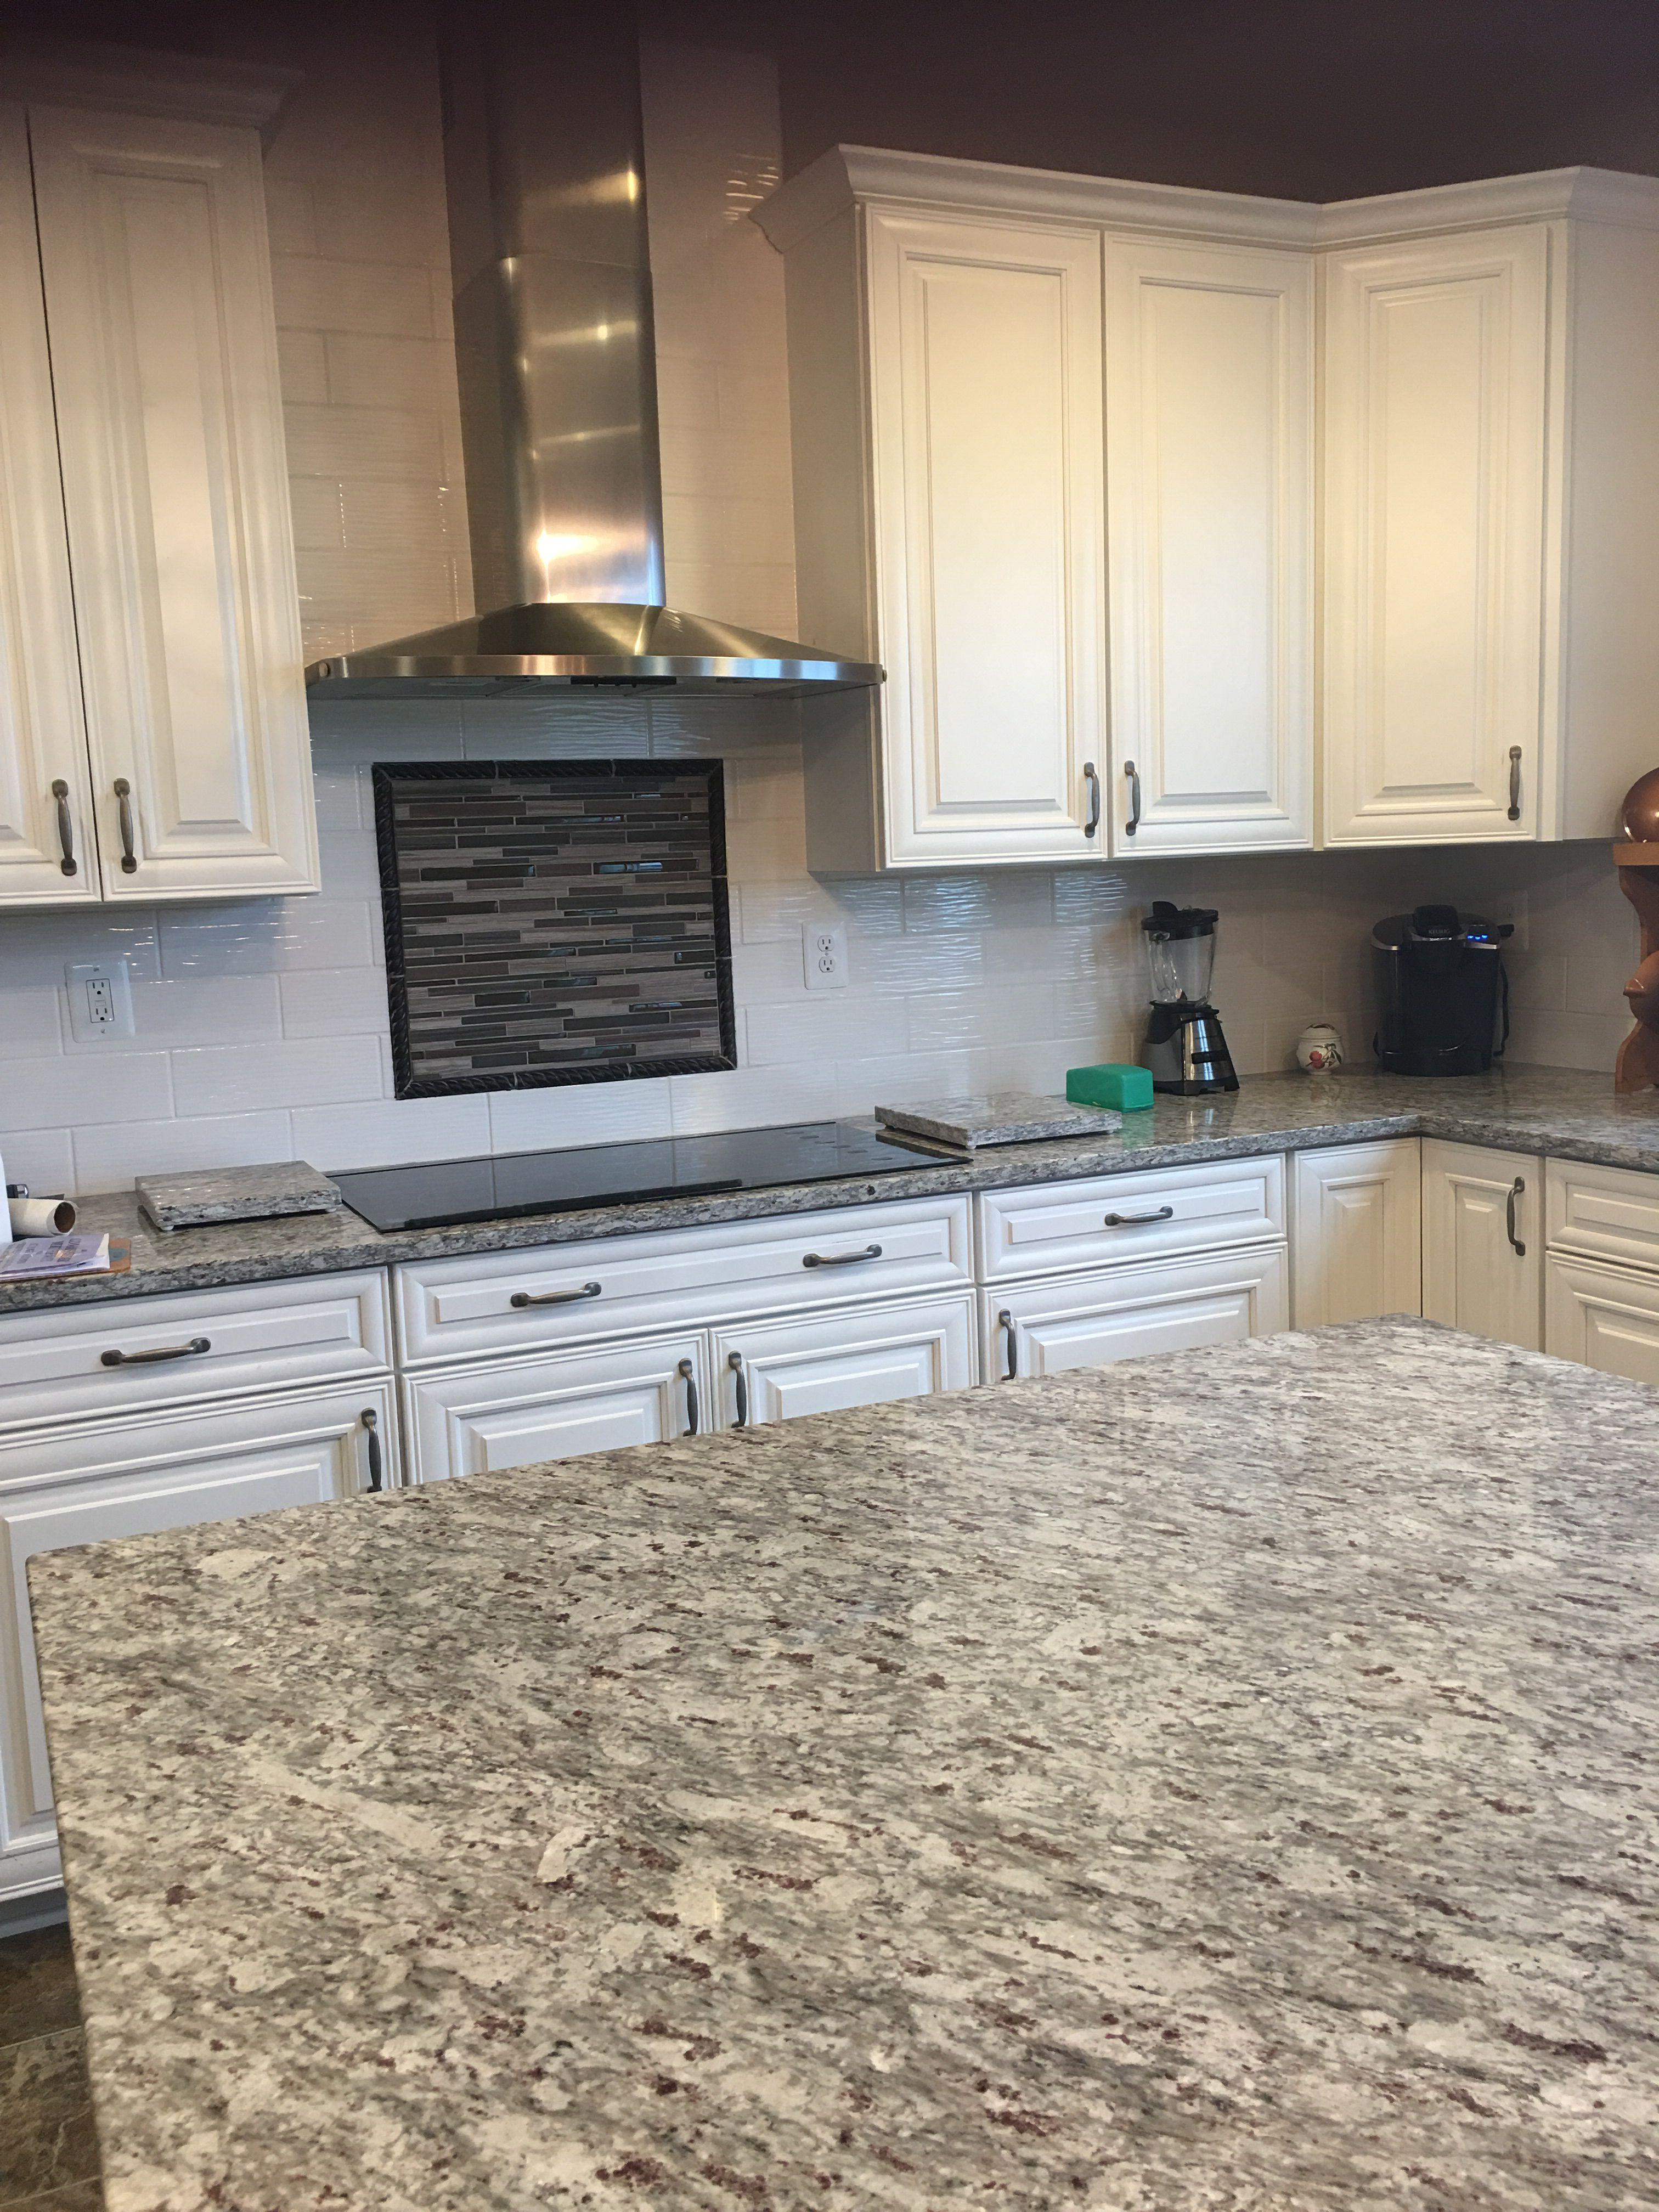 Moon White Granite Allen Roth Wavecrest White Tile Backsplash Kenmore Cooktop Kenmore Hoo White Tile Backsplash Ivory Shaker Kitchen Dream Kitchens Design